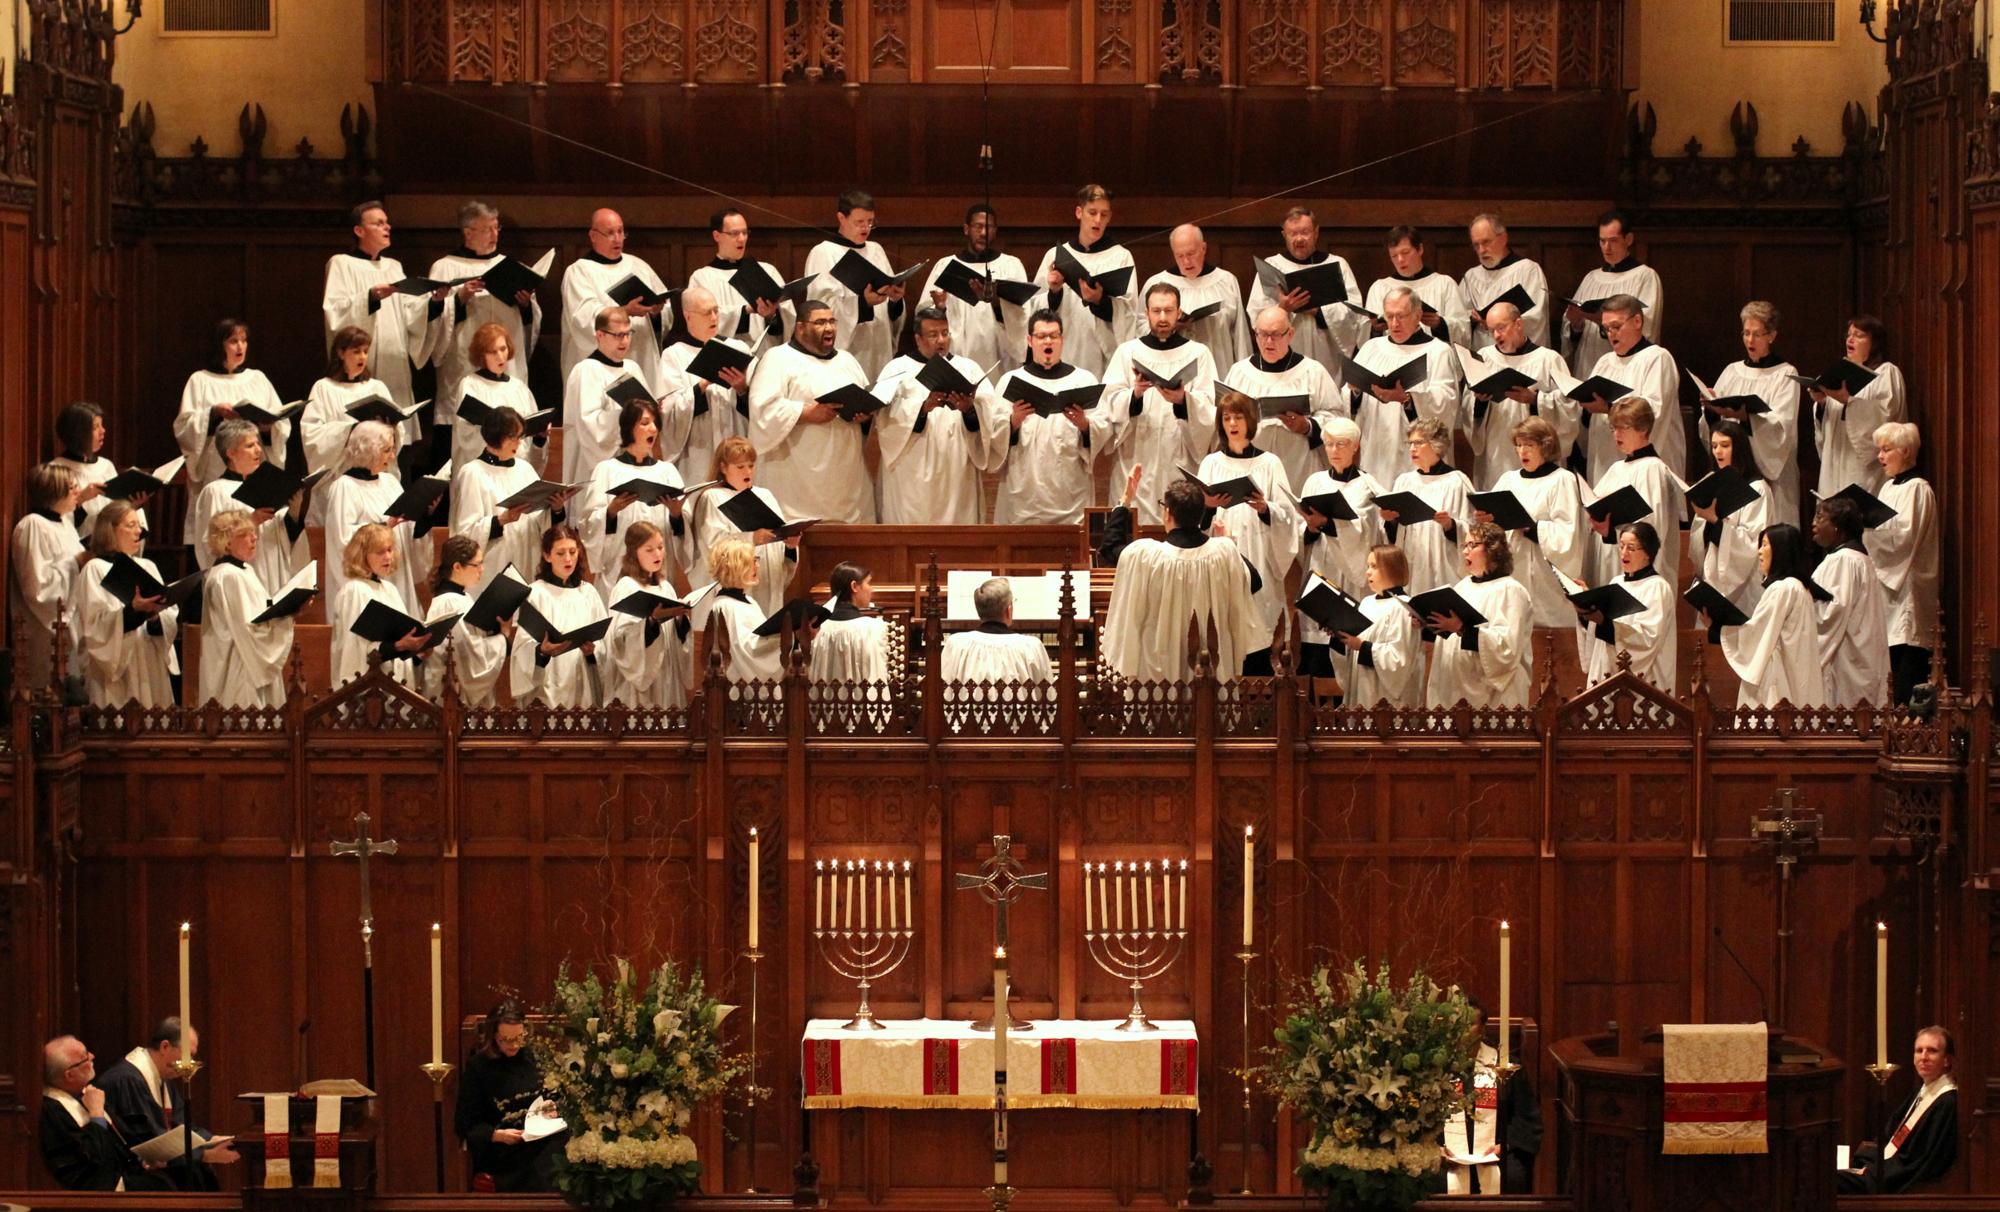 St. Paul's Choir, Easter 2015.  Photograph by Rev. Danny Yang